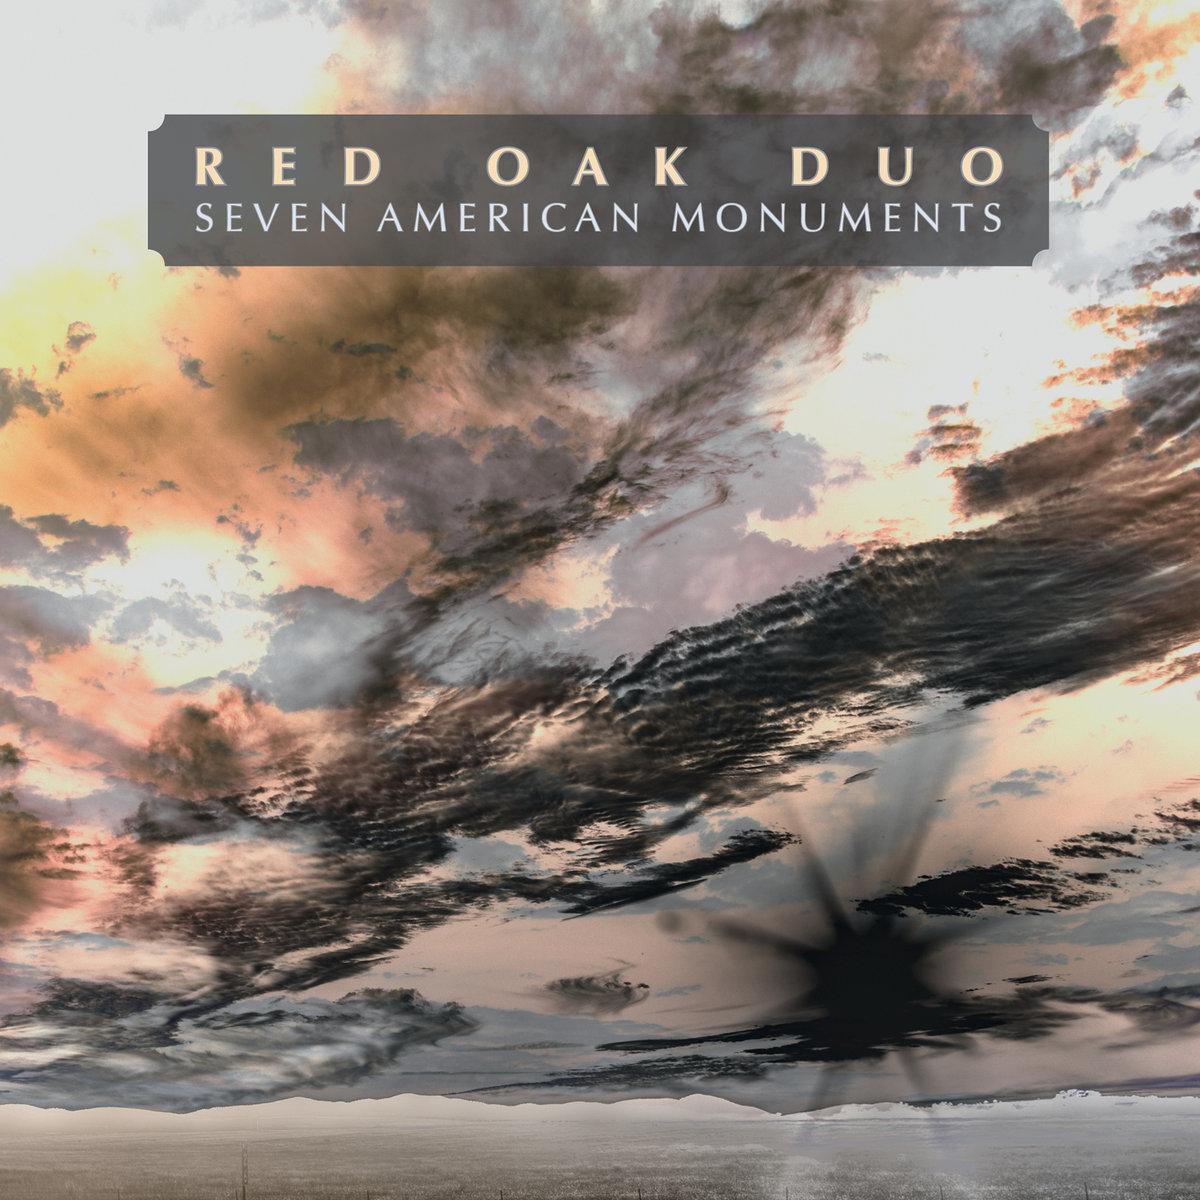 0045 Red Oak Duo Seven American Monuments.jpg